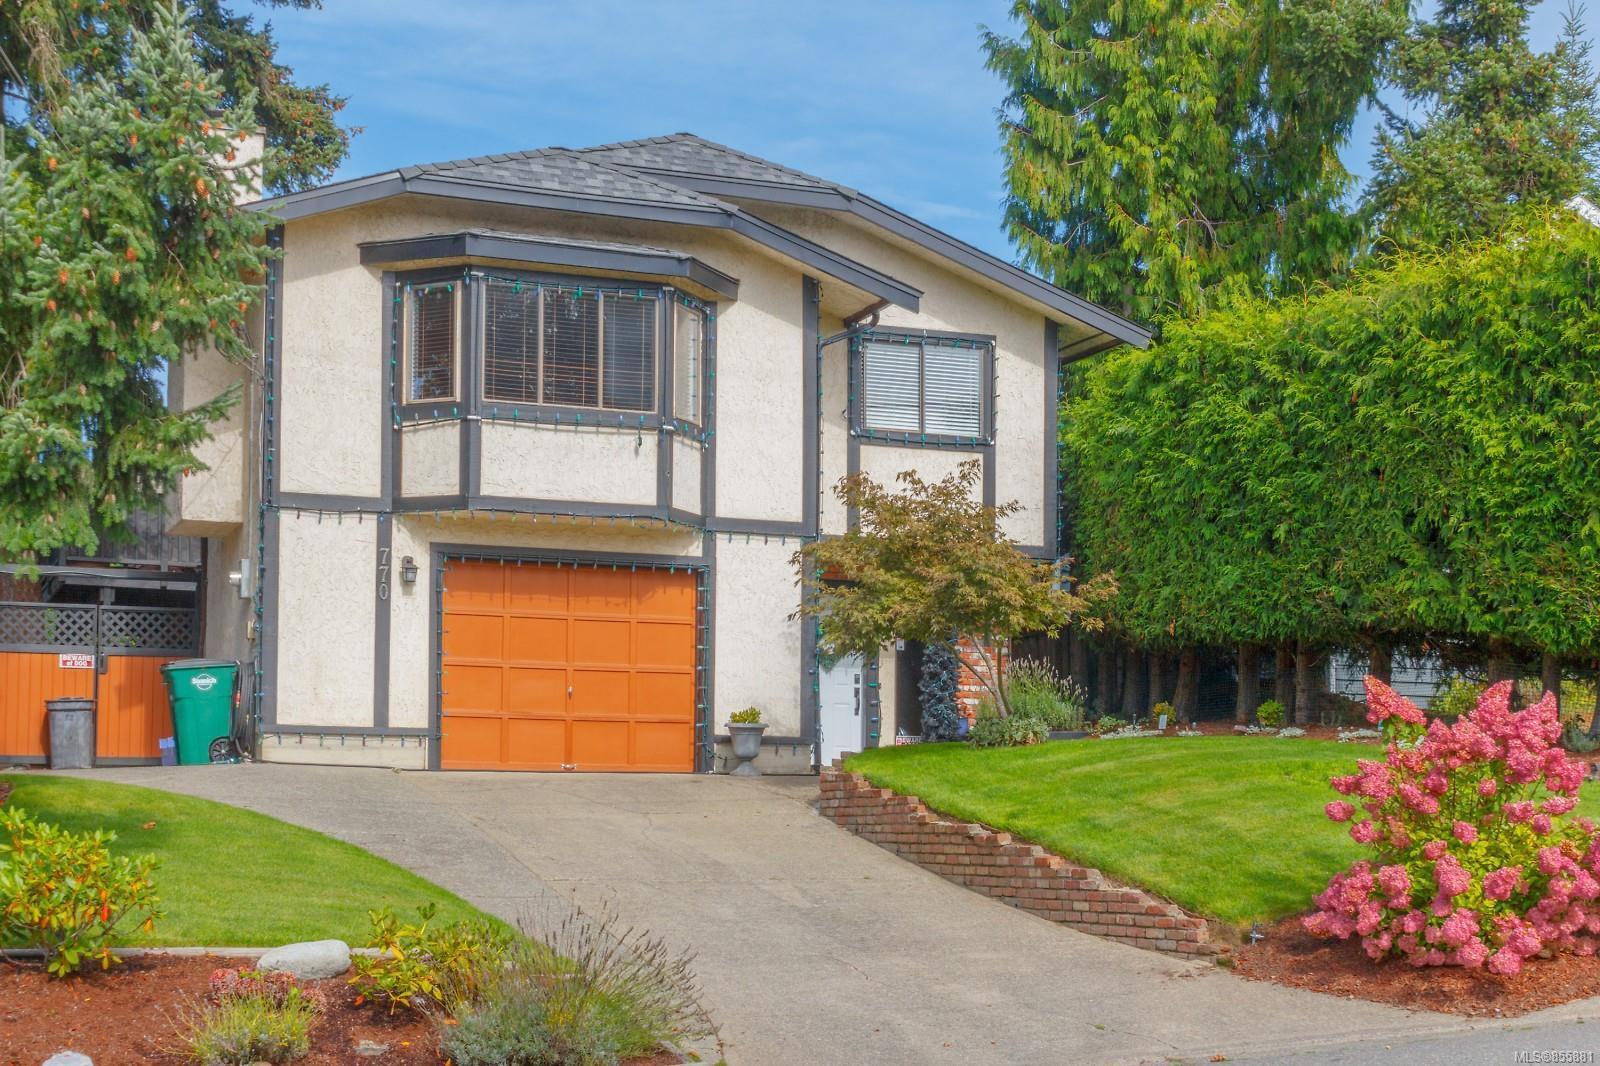 Main Photo: 770 Mann Ave in : SW Royal Oak House for sale (Saanich West)  : MLS®# 855881